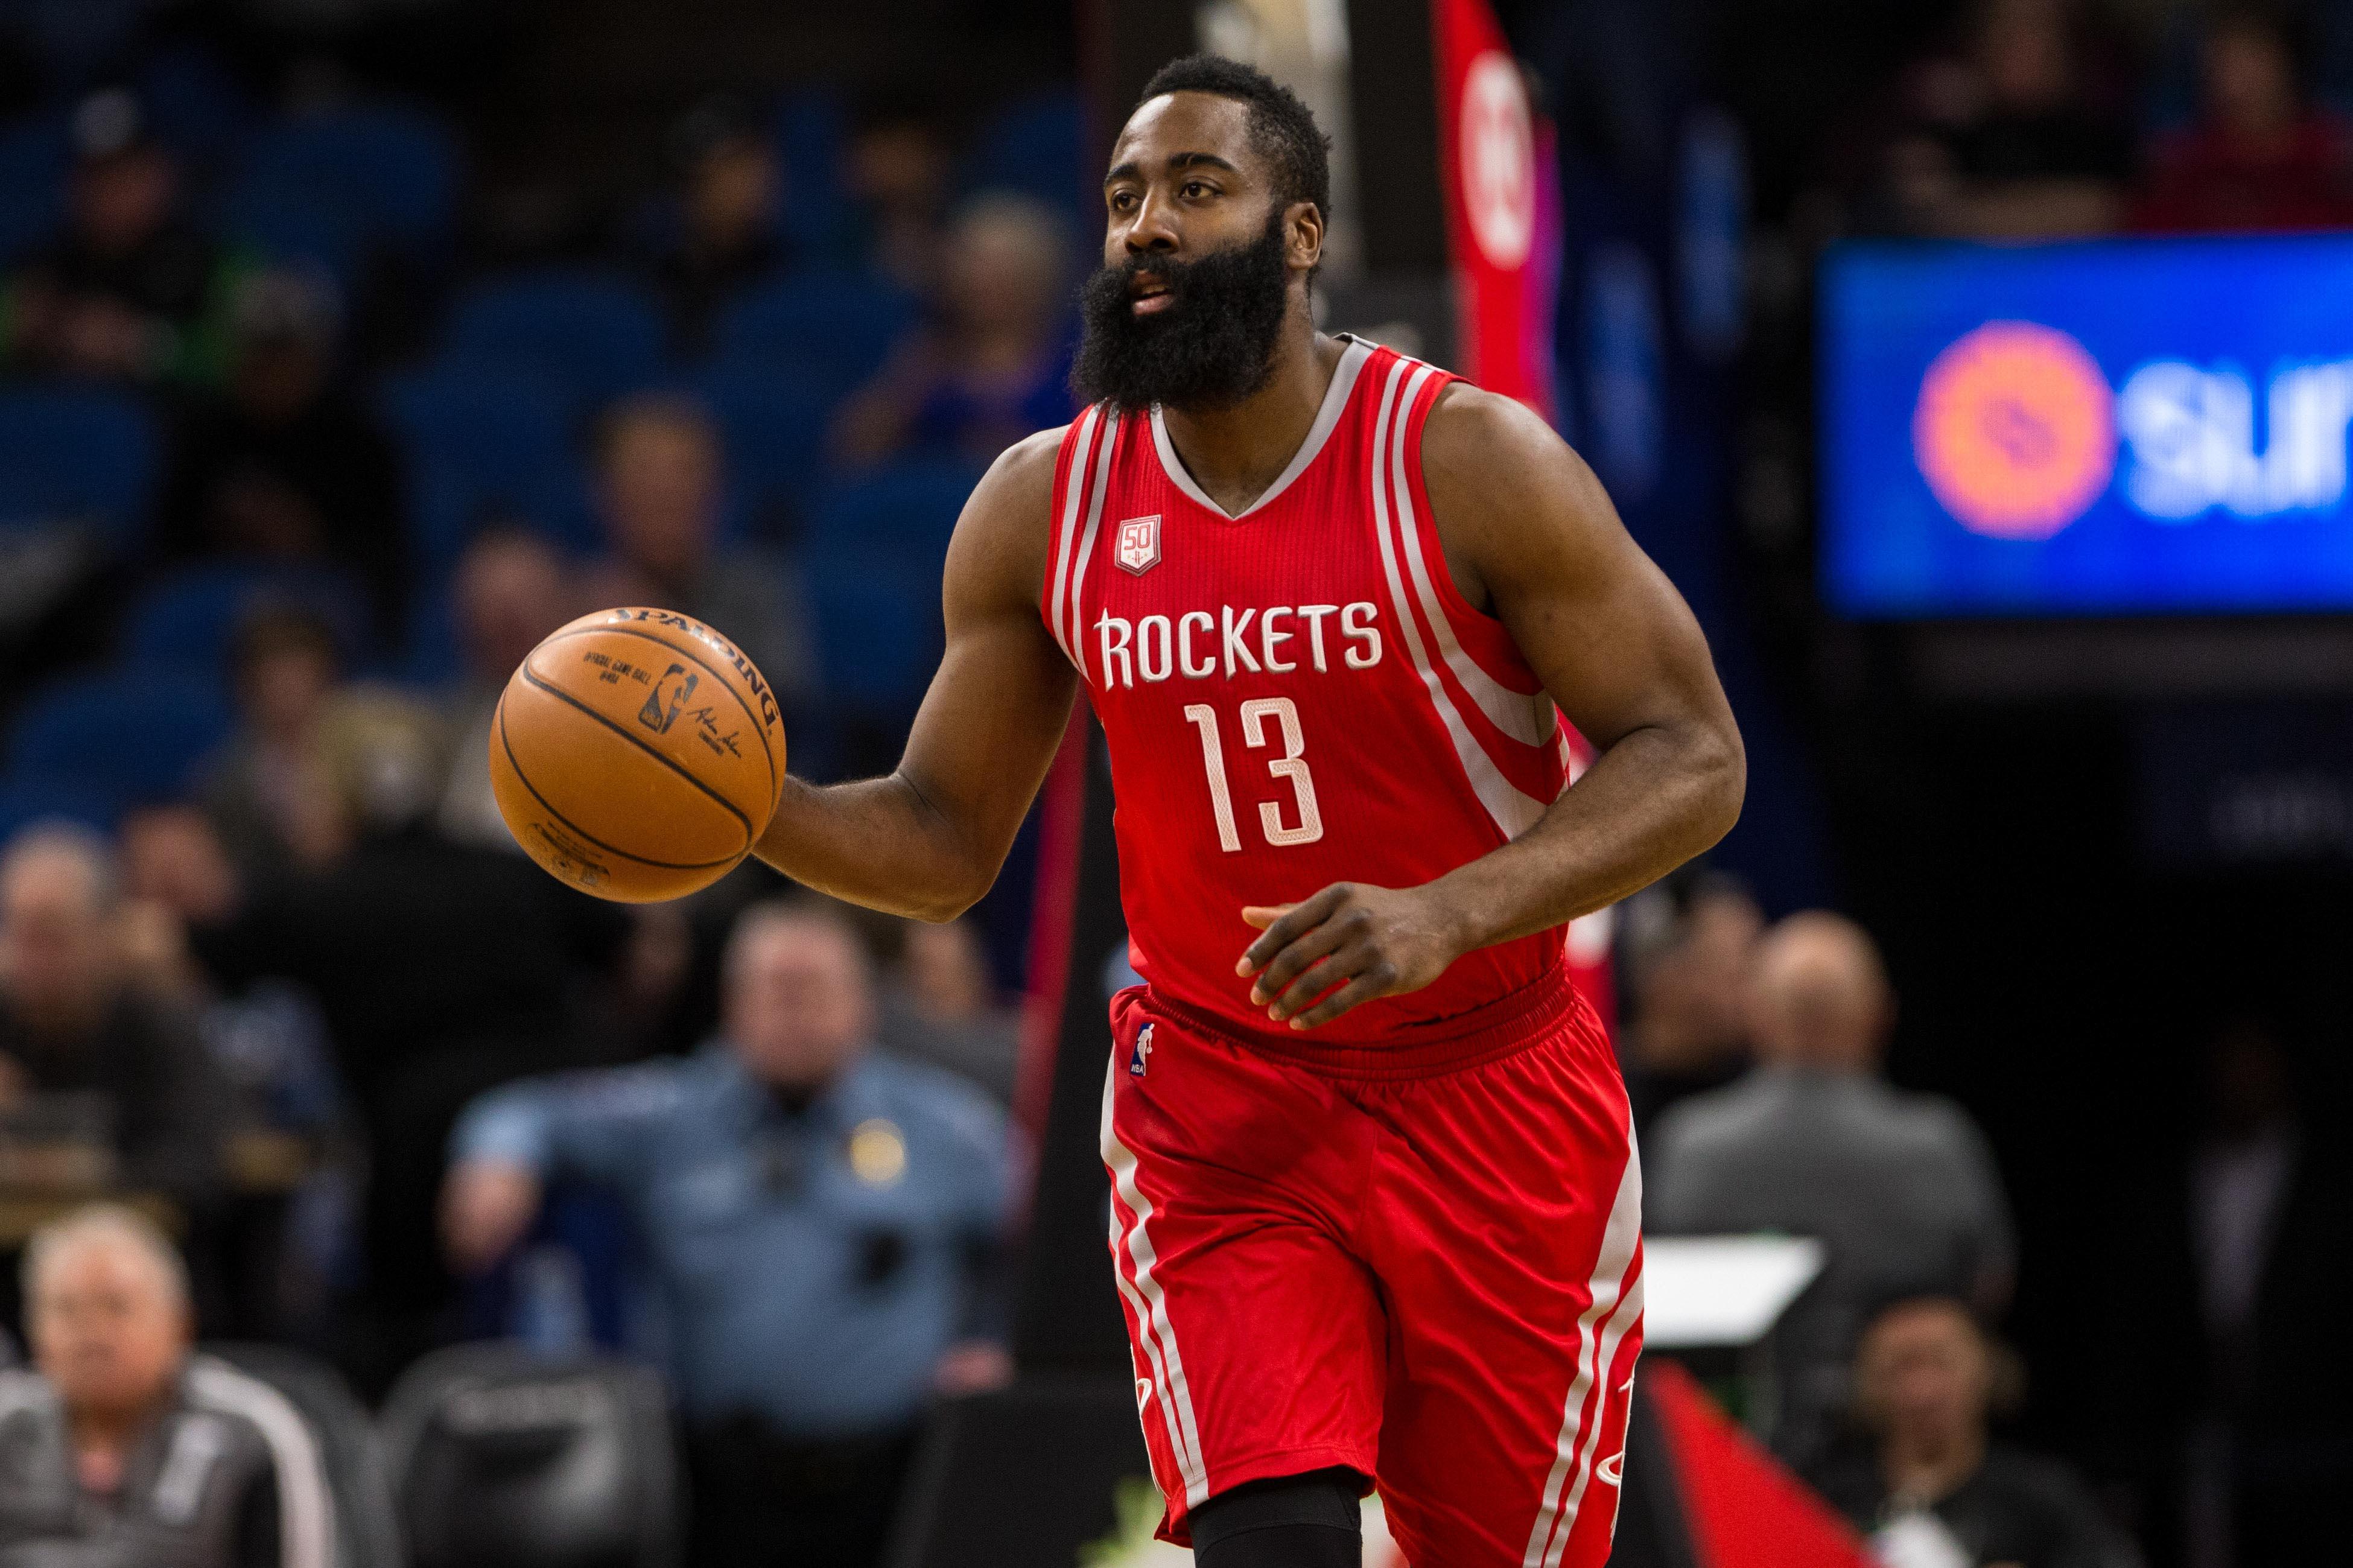 Rockets Houston